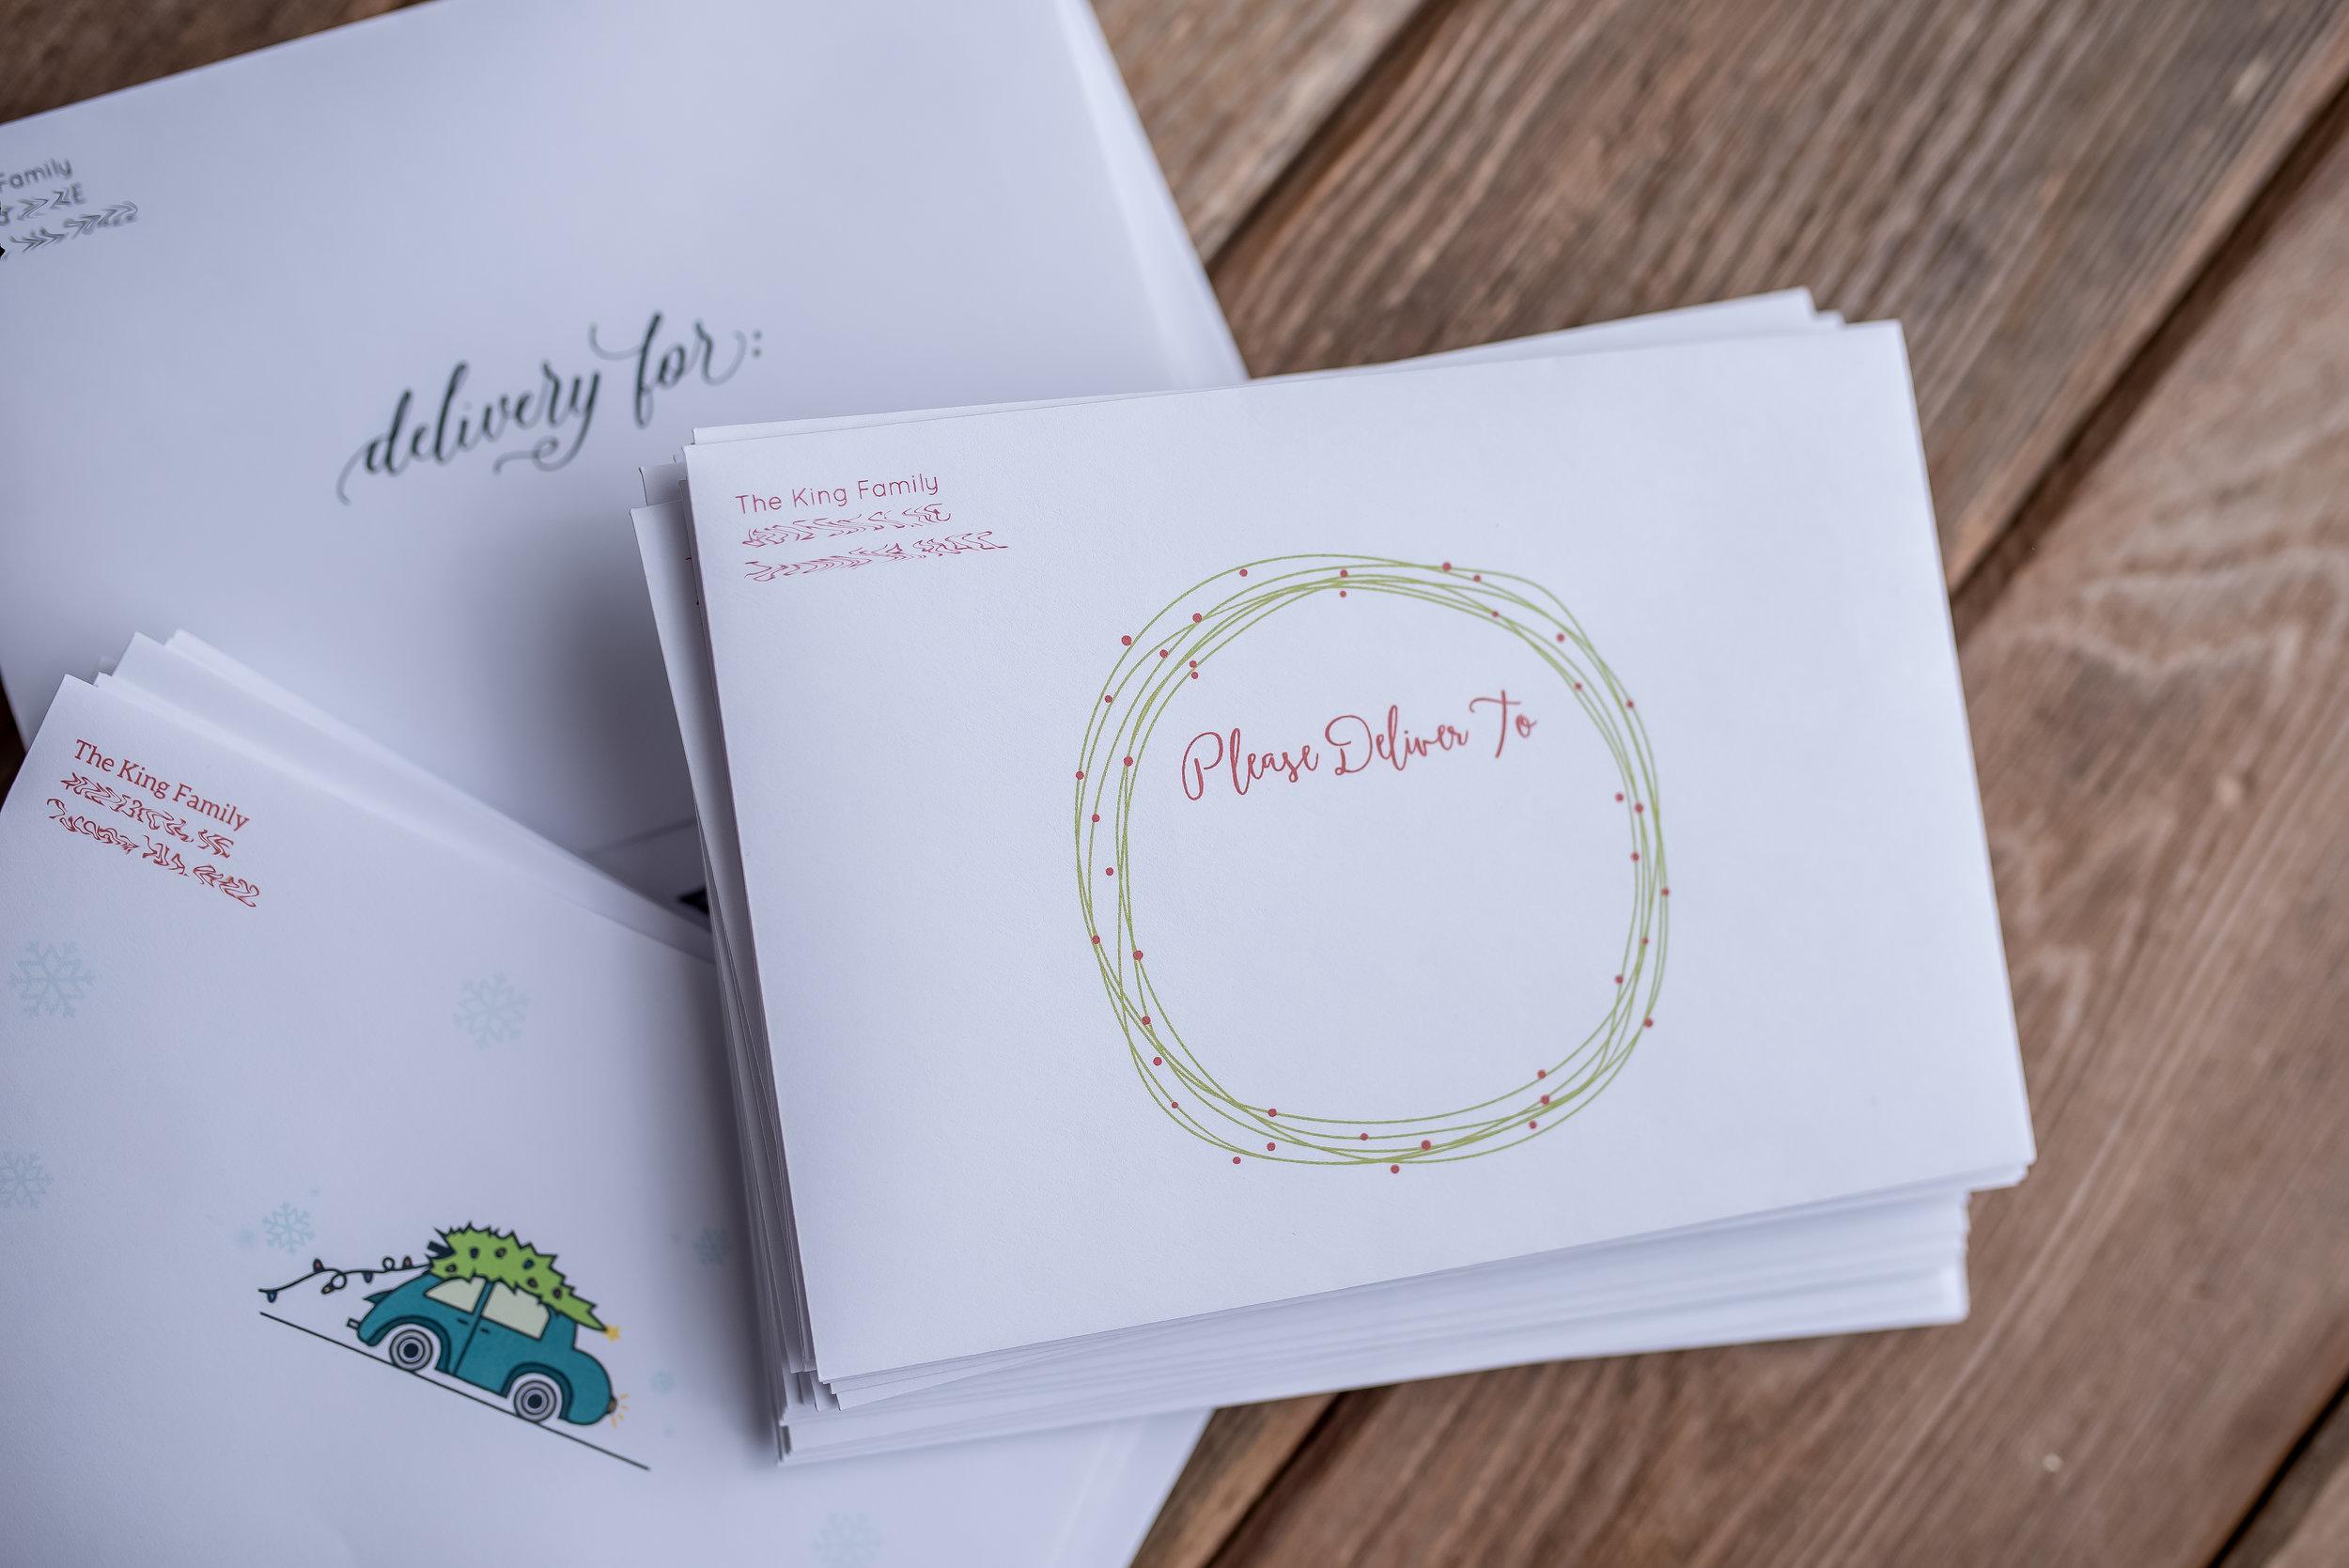 seattle christmas mini sessions tacoma christmas minis holiday photo greeting cards